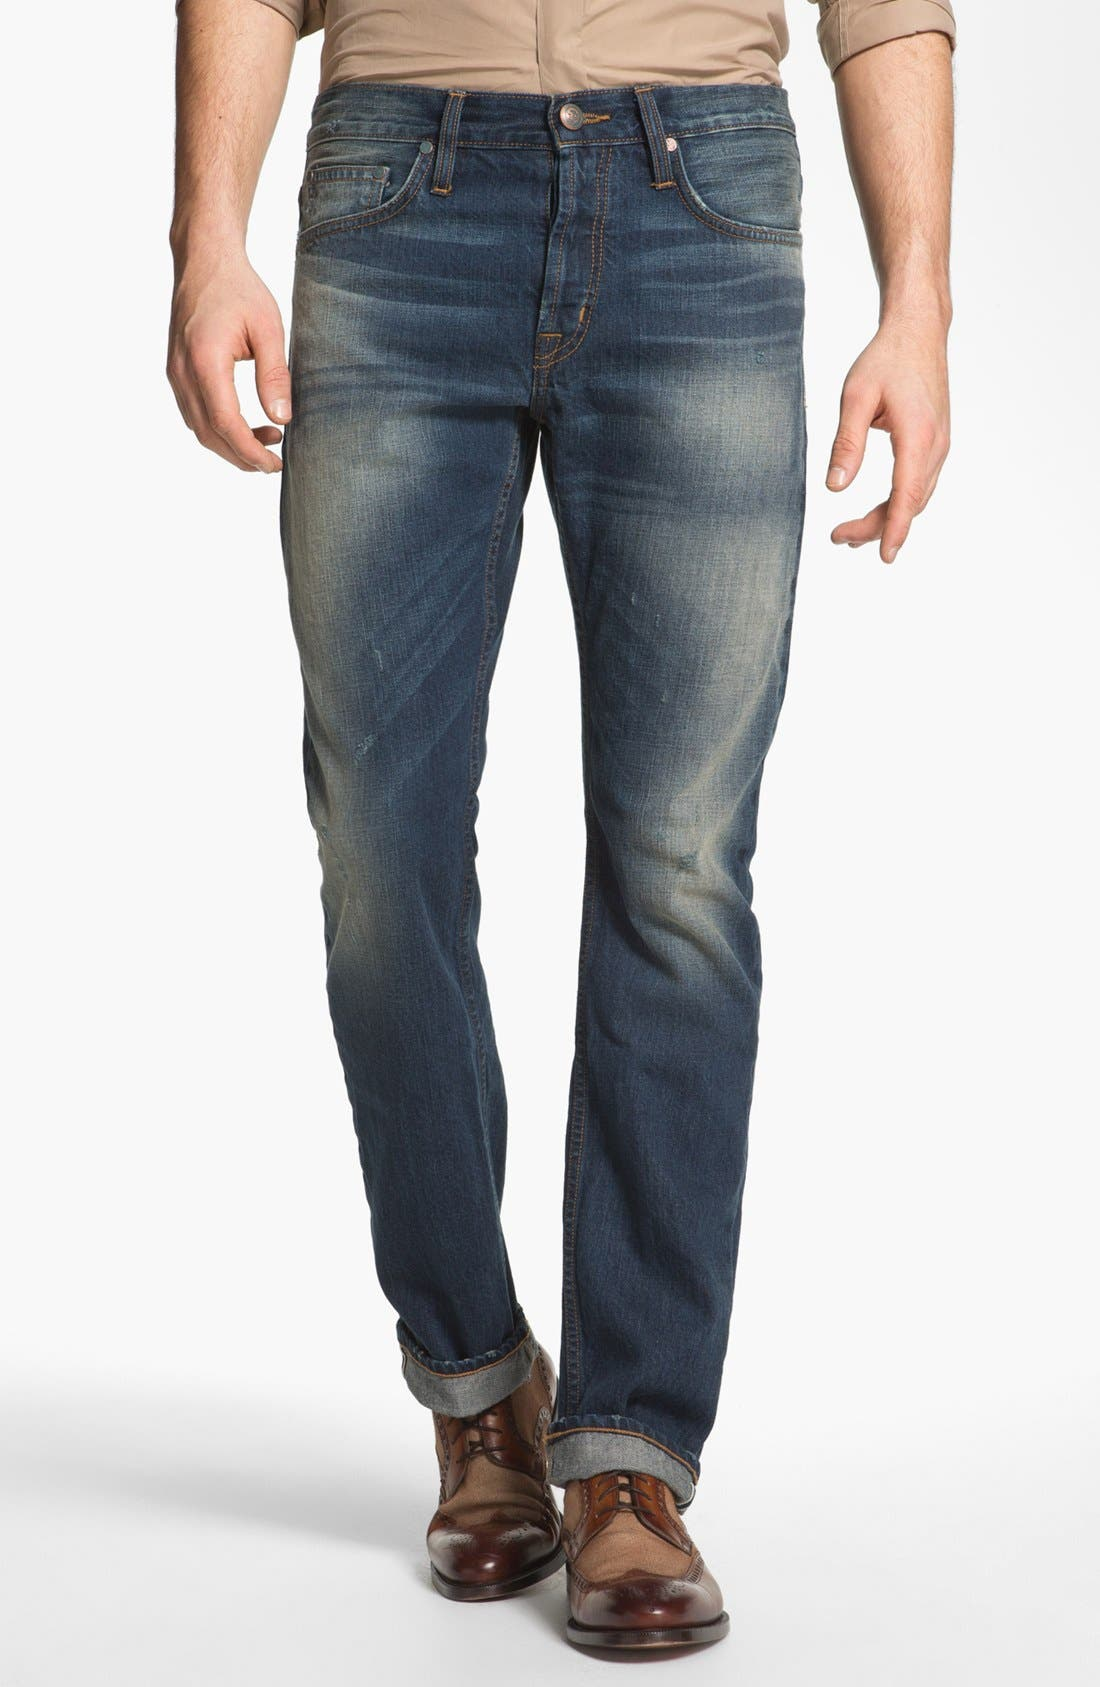 Alternate Image 1 Selected - Asbury Park '1874 Monte Carlo' Straight Leg Selvedge Jeans (Harrison)